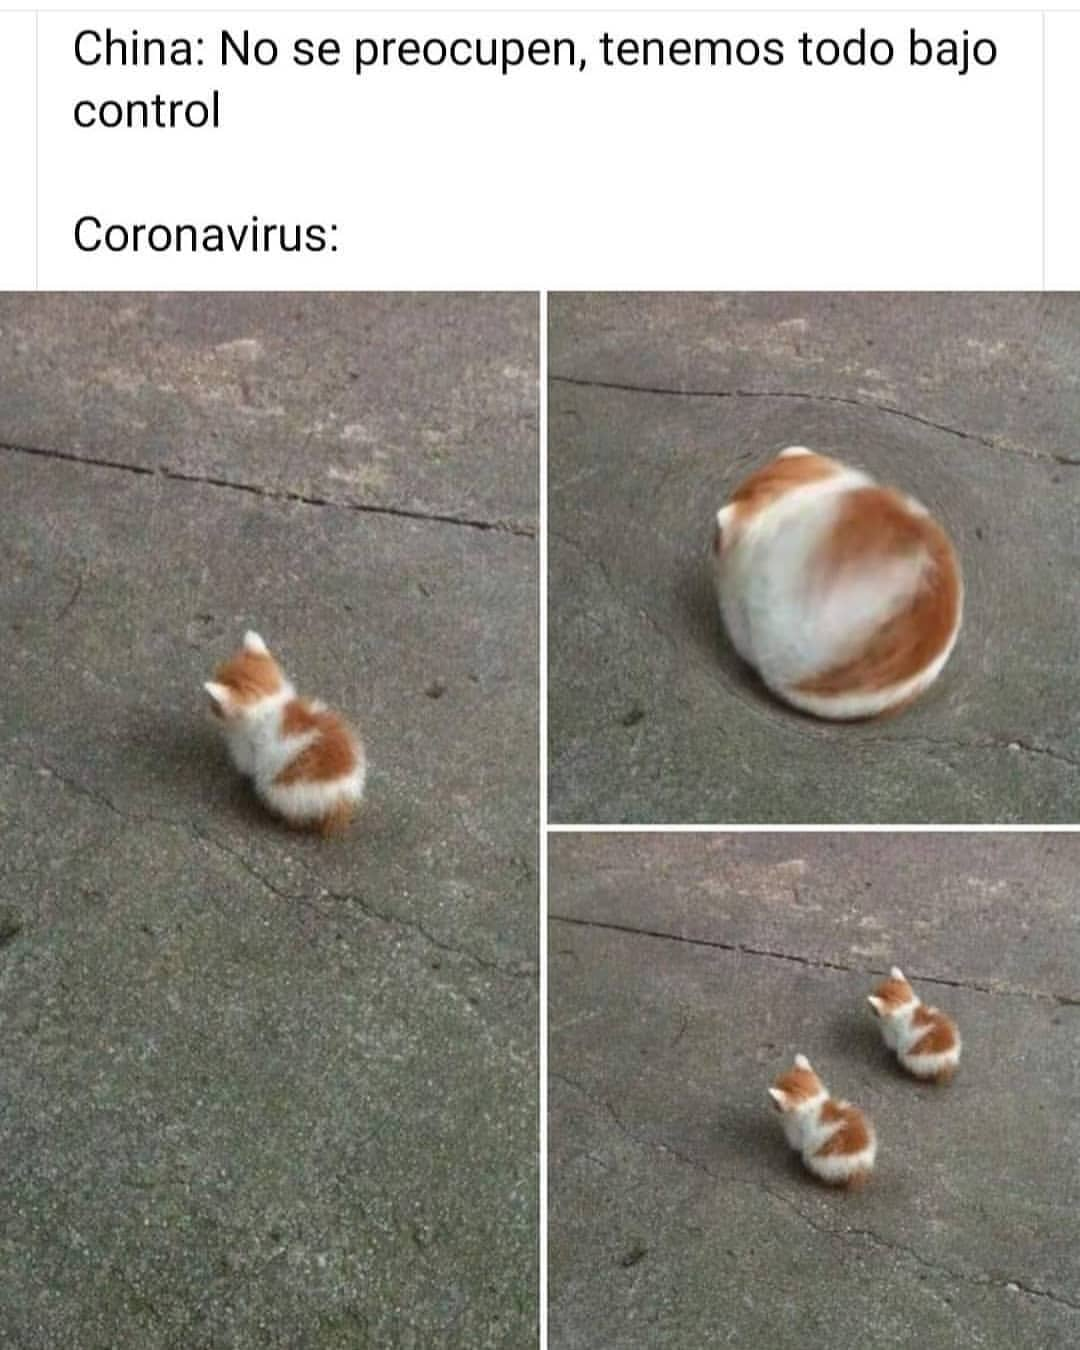 China: No se preocupen, tenemos todo bajo control.  Coronavirus: